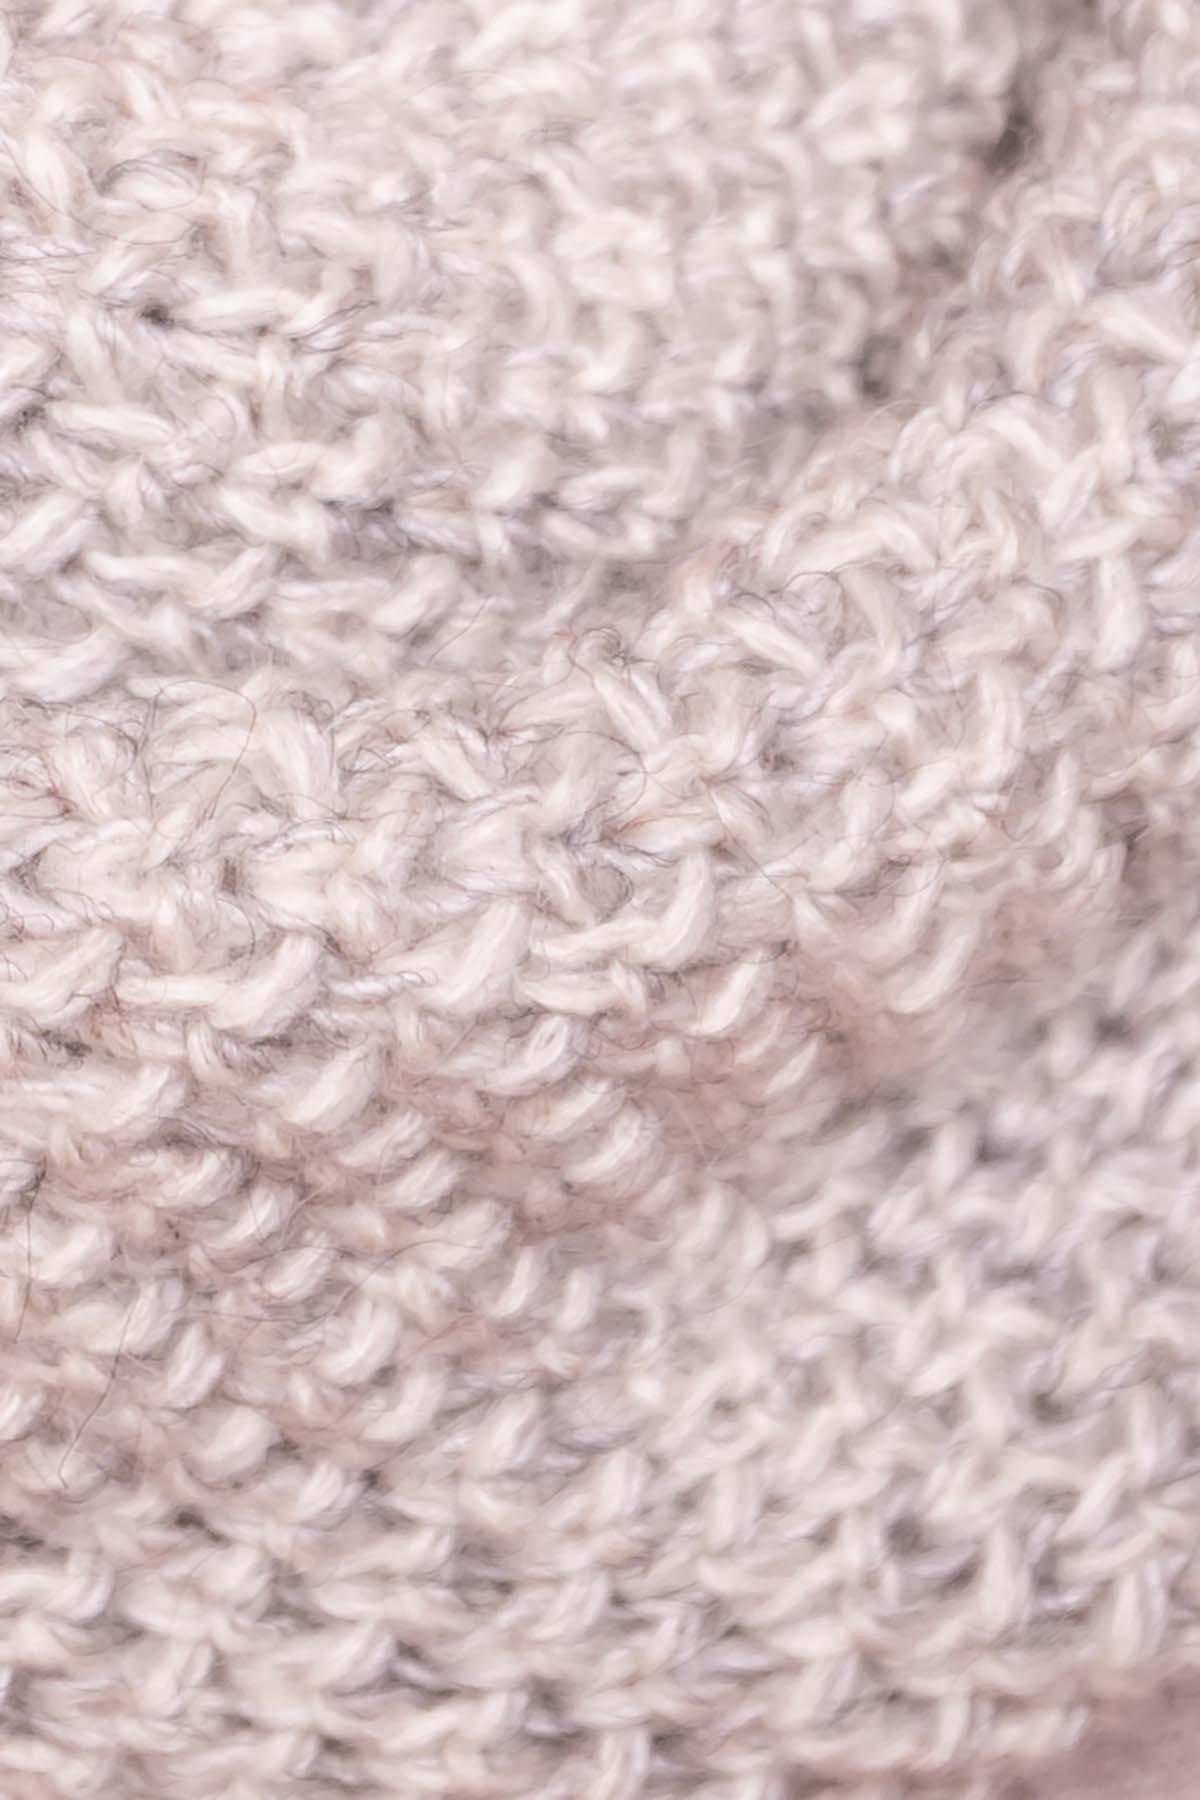 Шарф - хомут 3347 АРТ. 41740 Цвет: Молоко - фото 3, интернет магазин tm-modus.ru